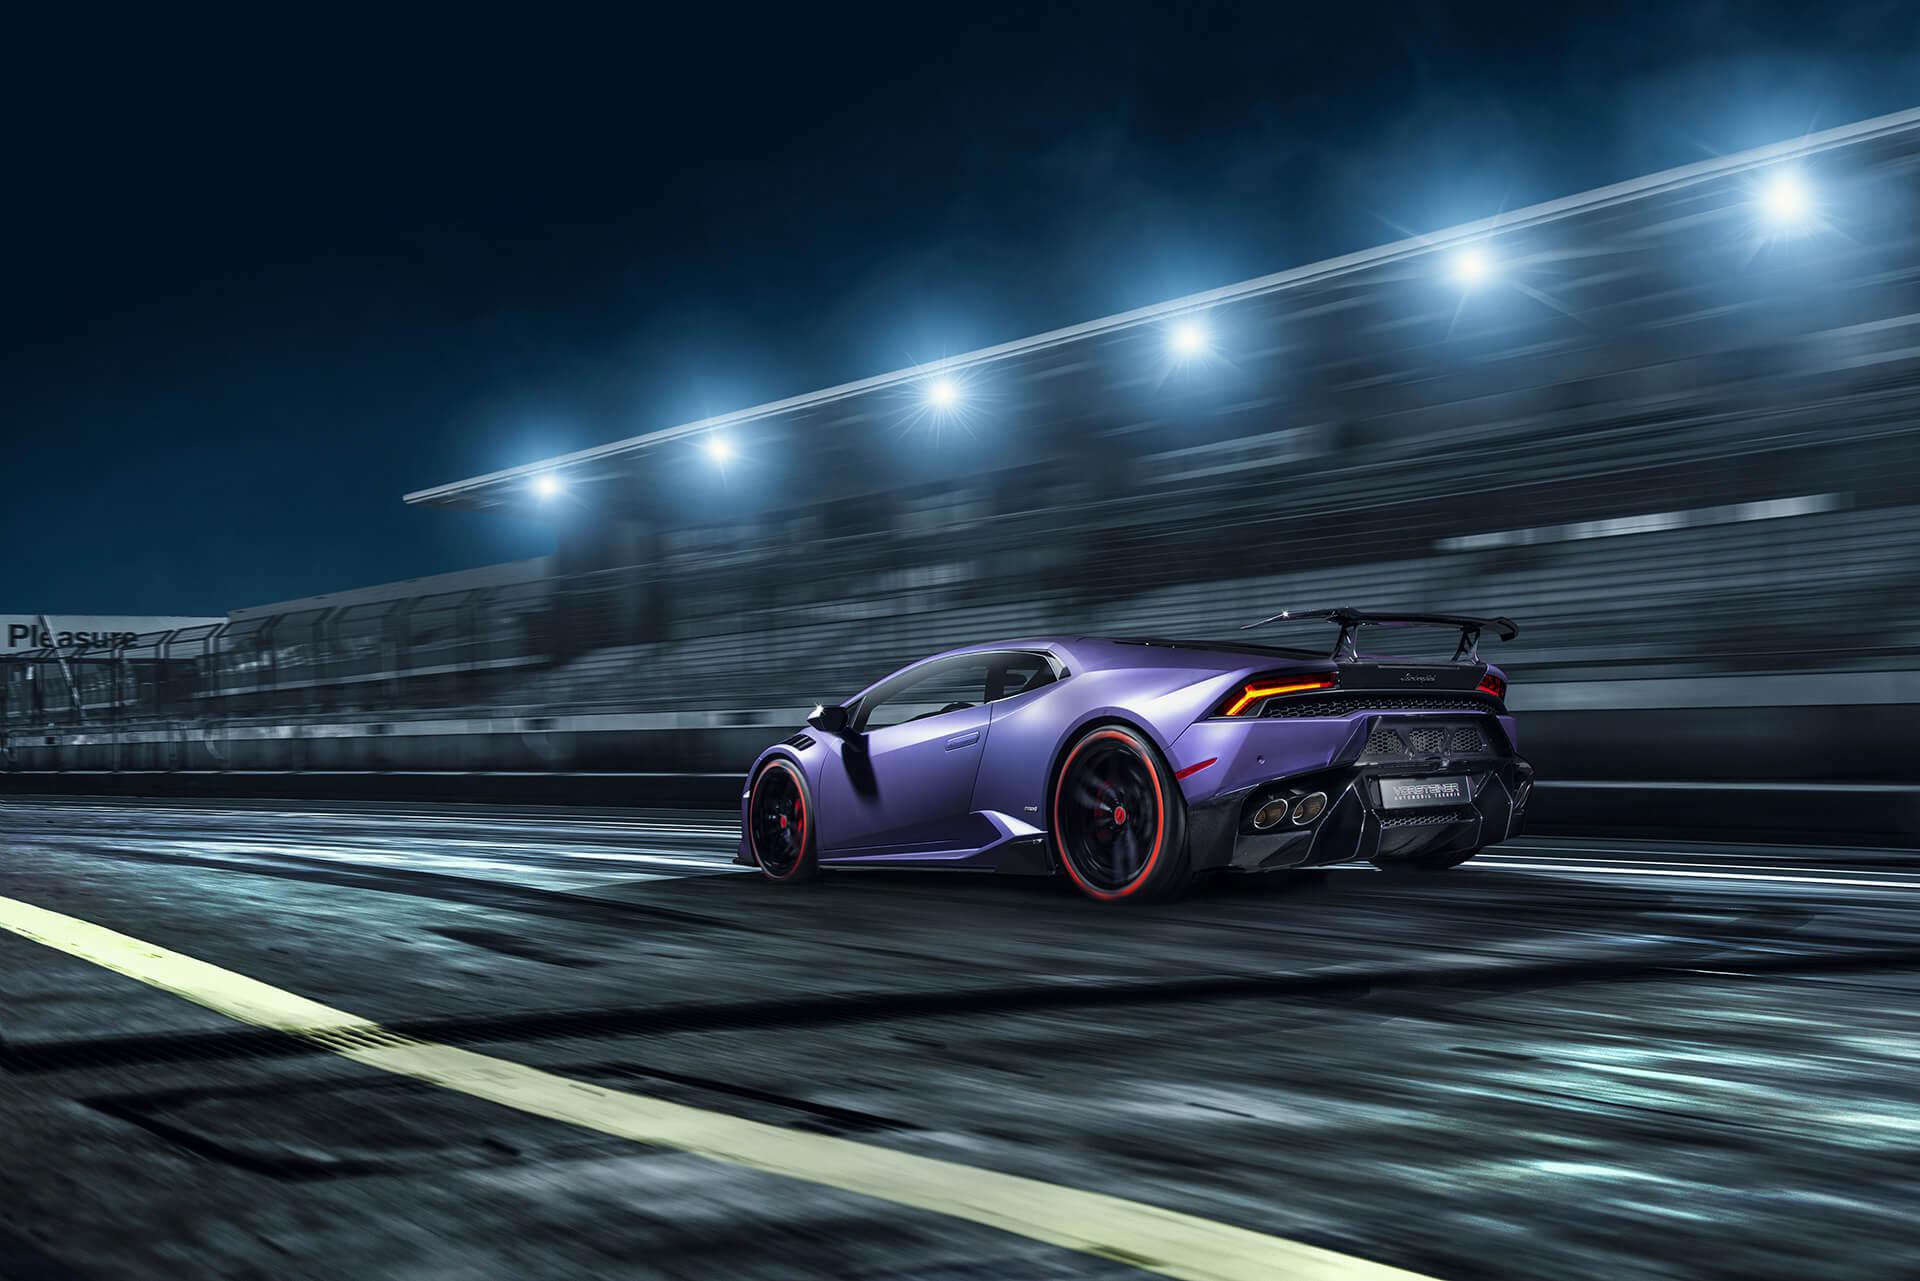 Lamborghini-Huracan-Vorsteiner-Novara-lamborghini-supercars-vorsteiner-wallpaper-wp5208642